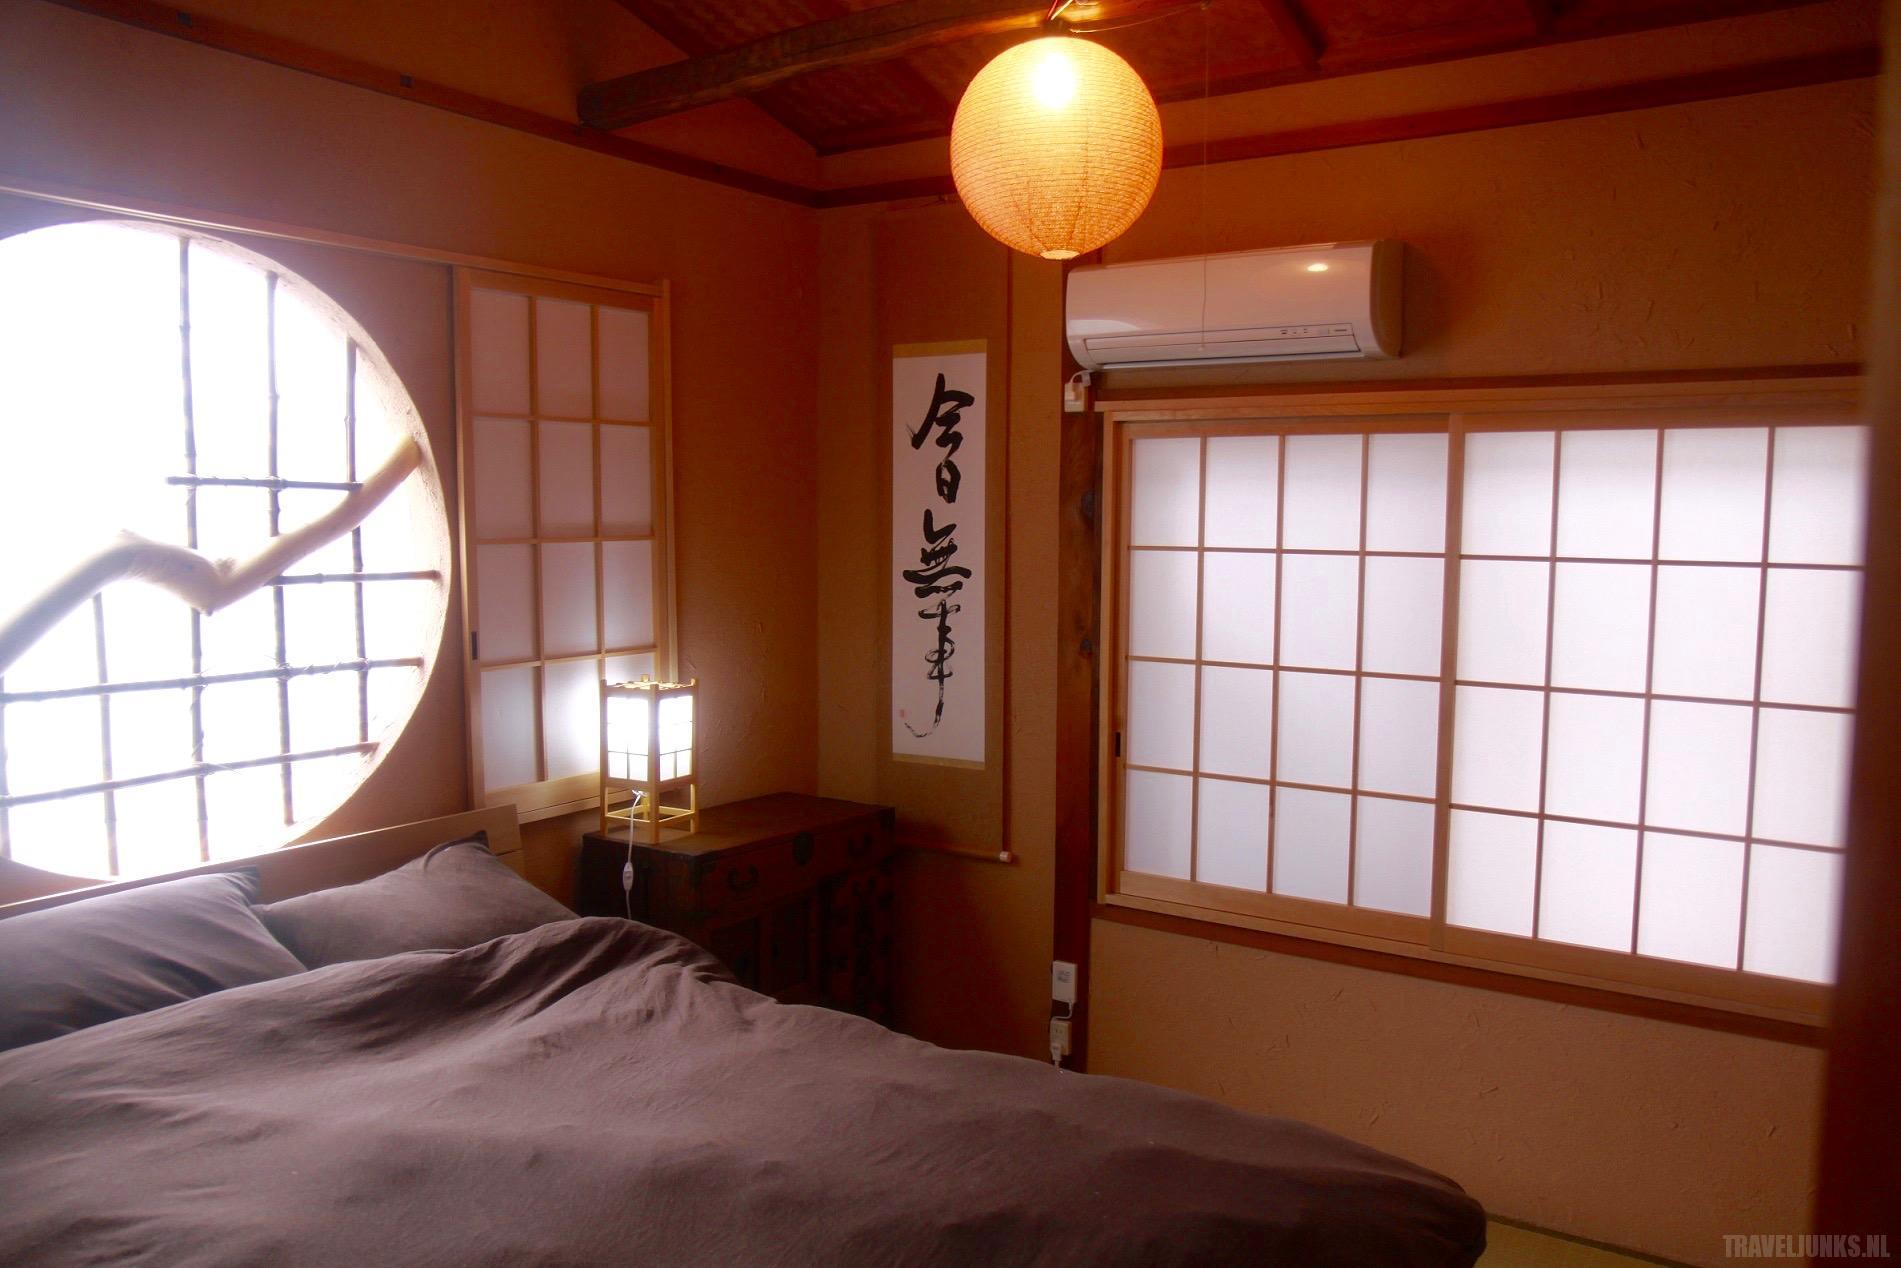 japanse slaapkamer great slaapkamer with japanse